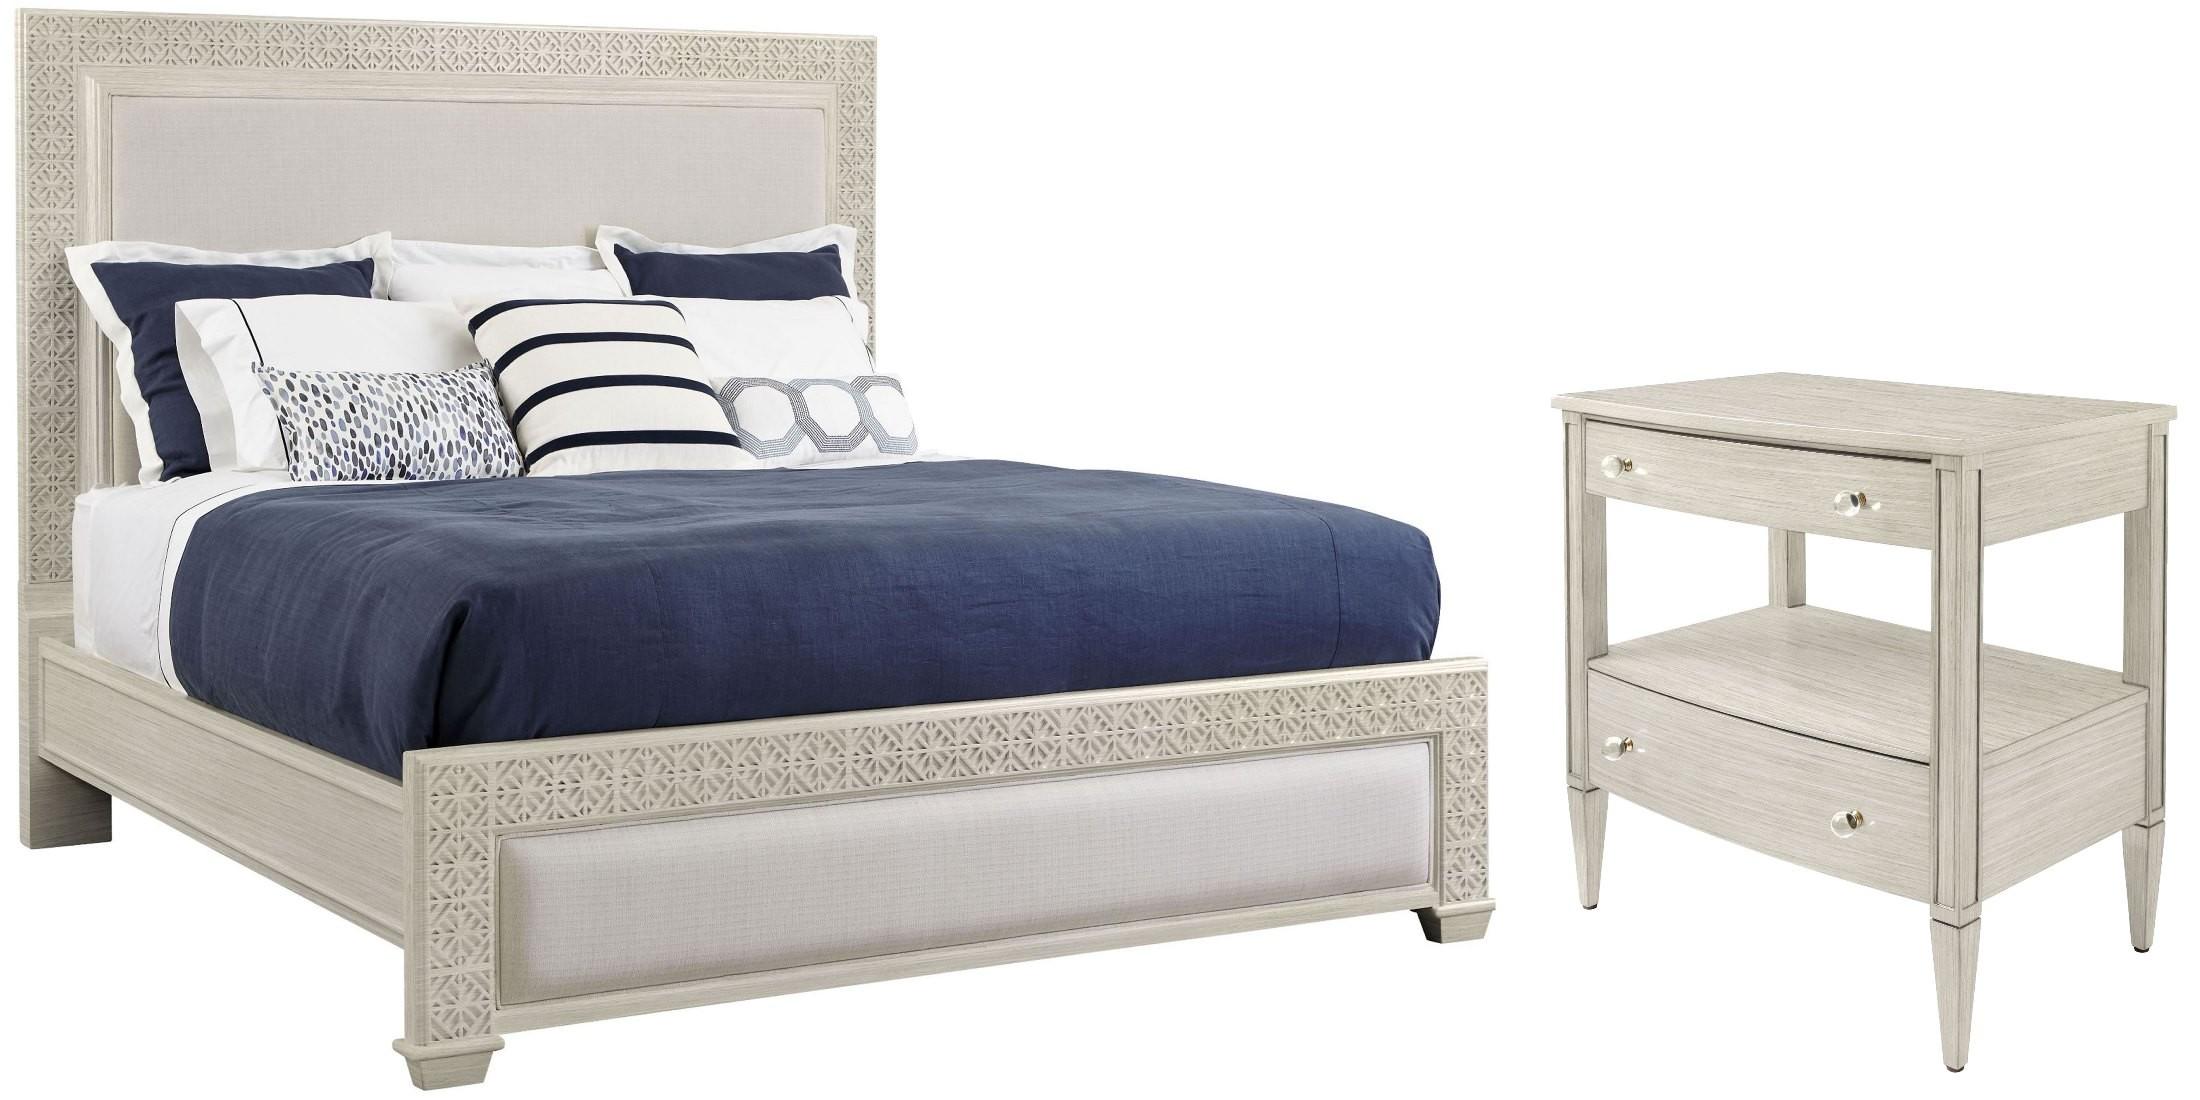 Coastal living oasis oyster catalina panel bedroom set for Coastal furniture